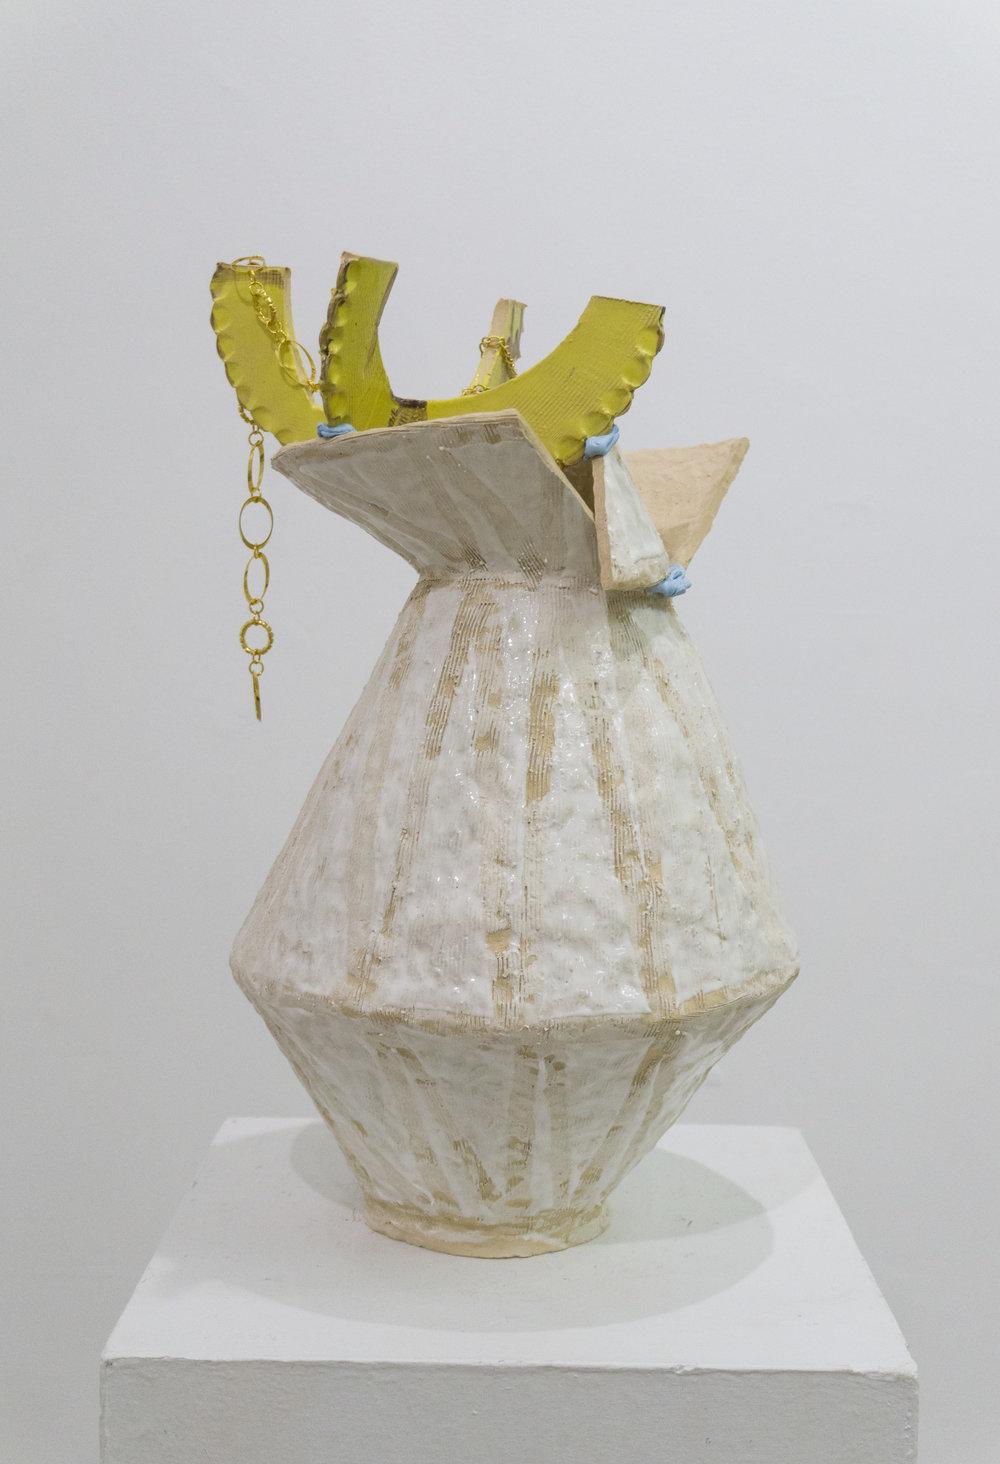 Untitled Fired earthenware, low fire glaze, Sculpey, gold jewelry 22h x 14l x 12w in 2016